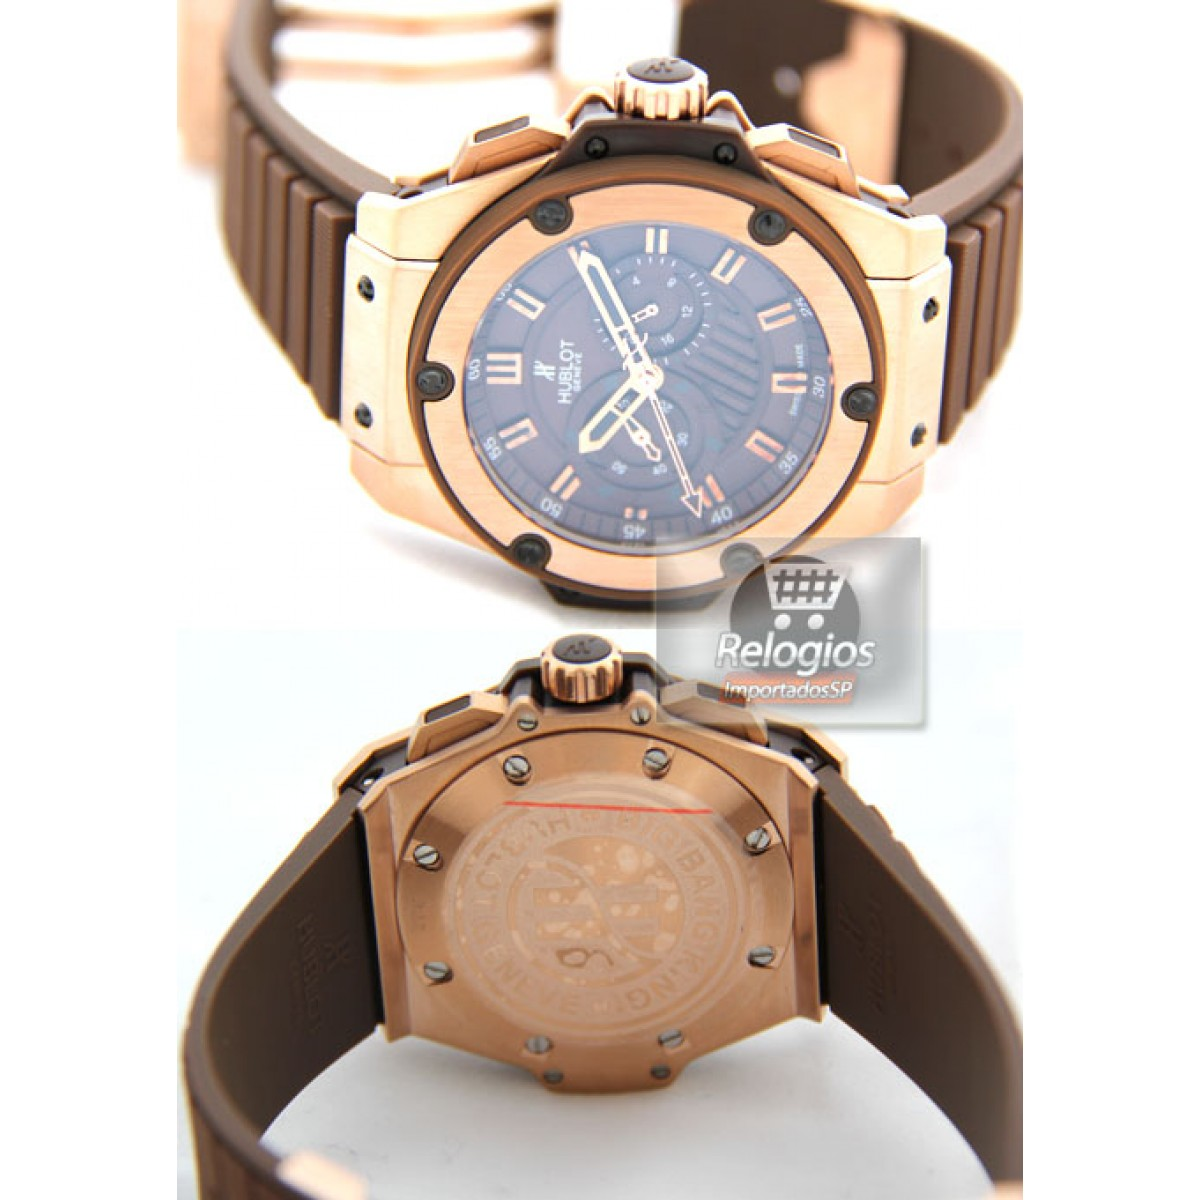 78c0260f5ab Relógio Réplica Hublot King Power Chocolate